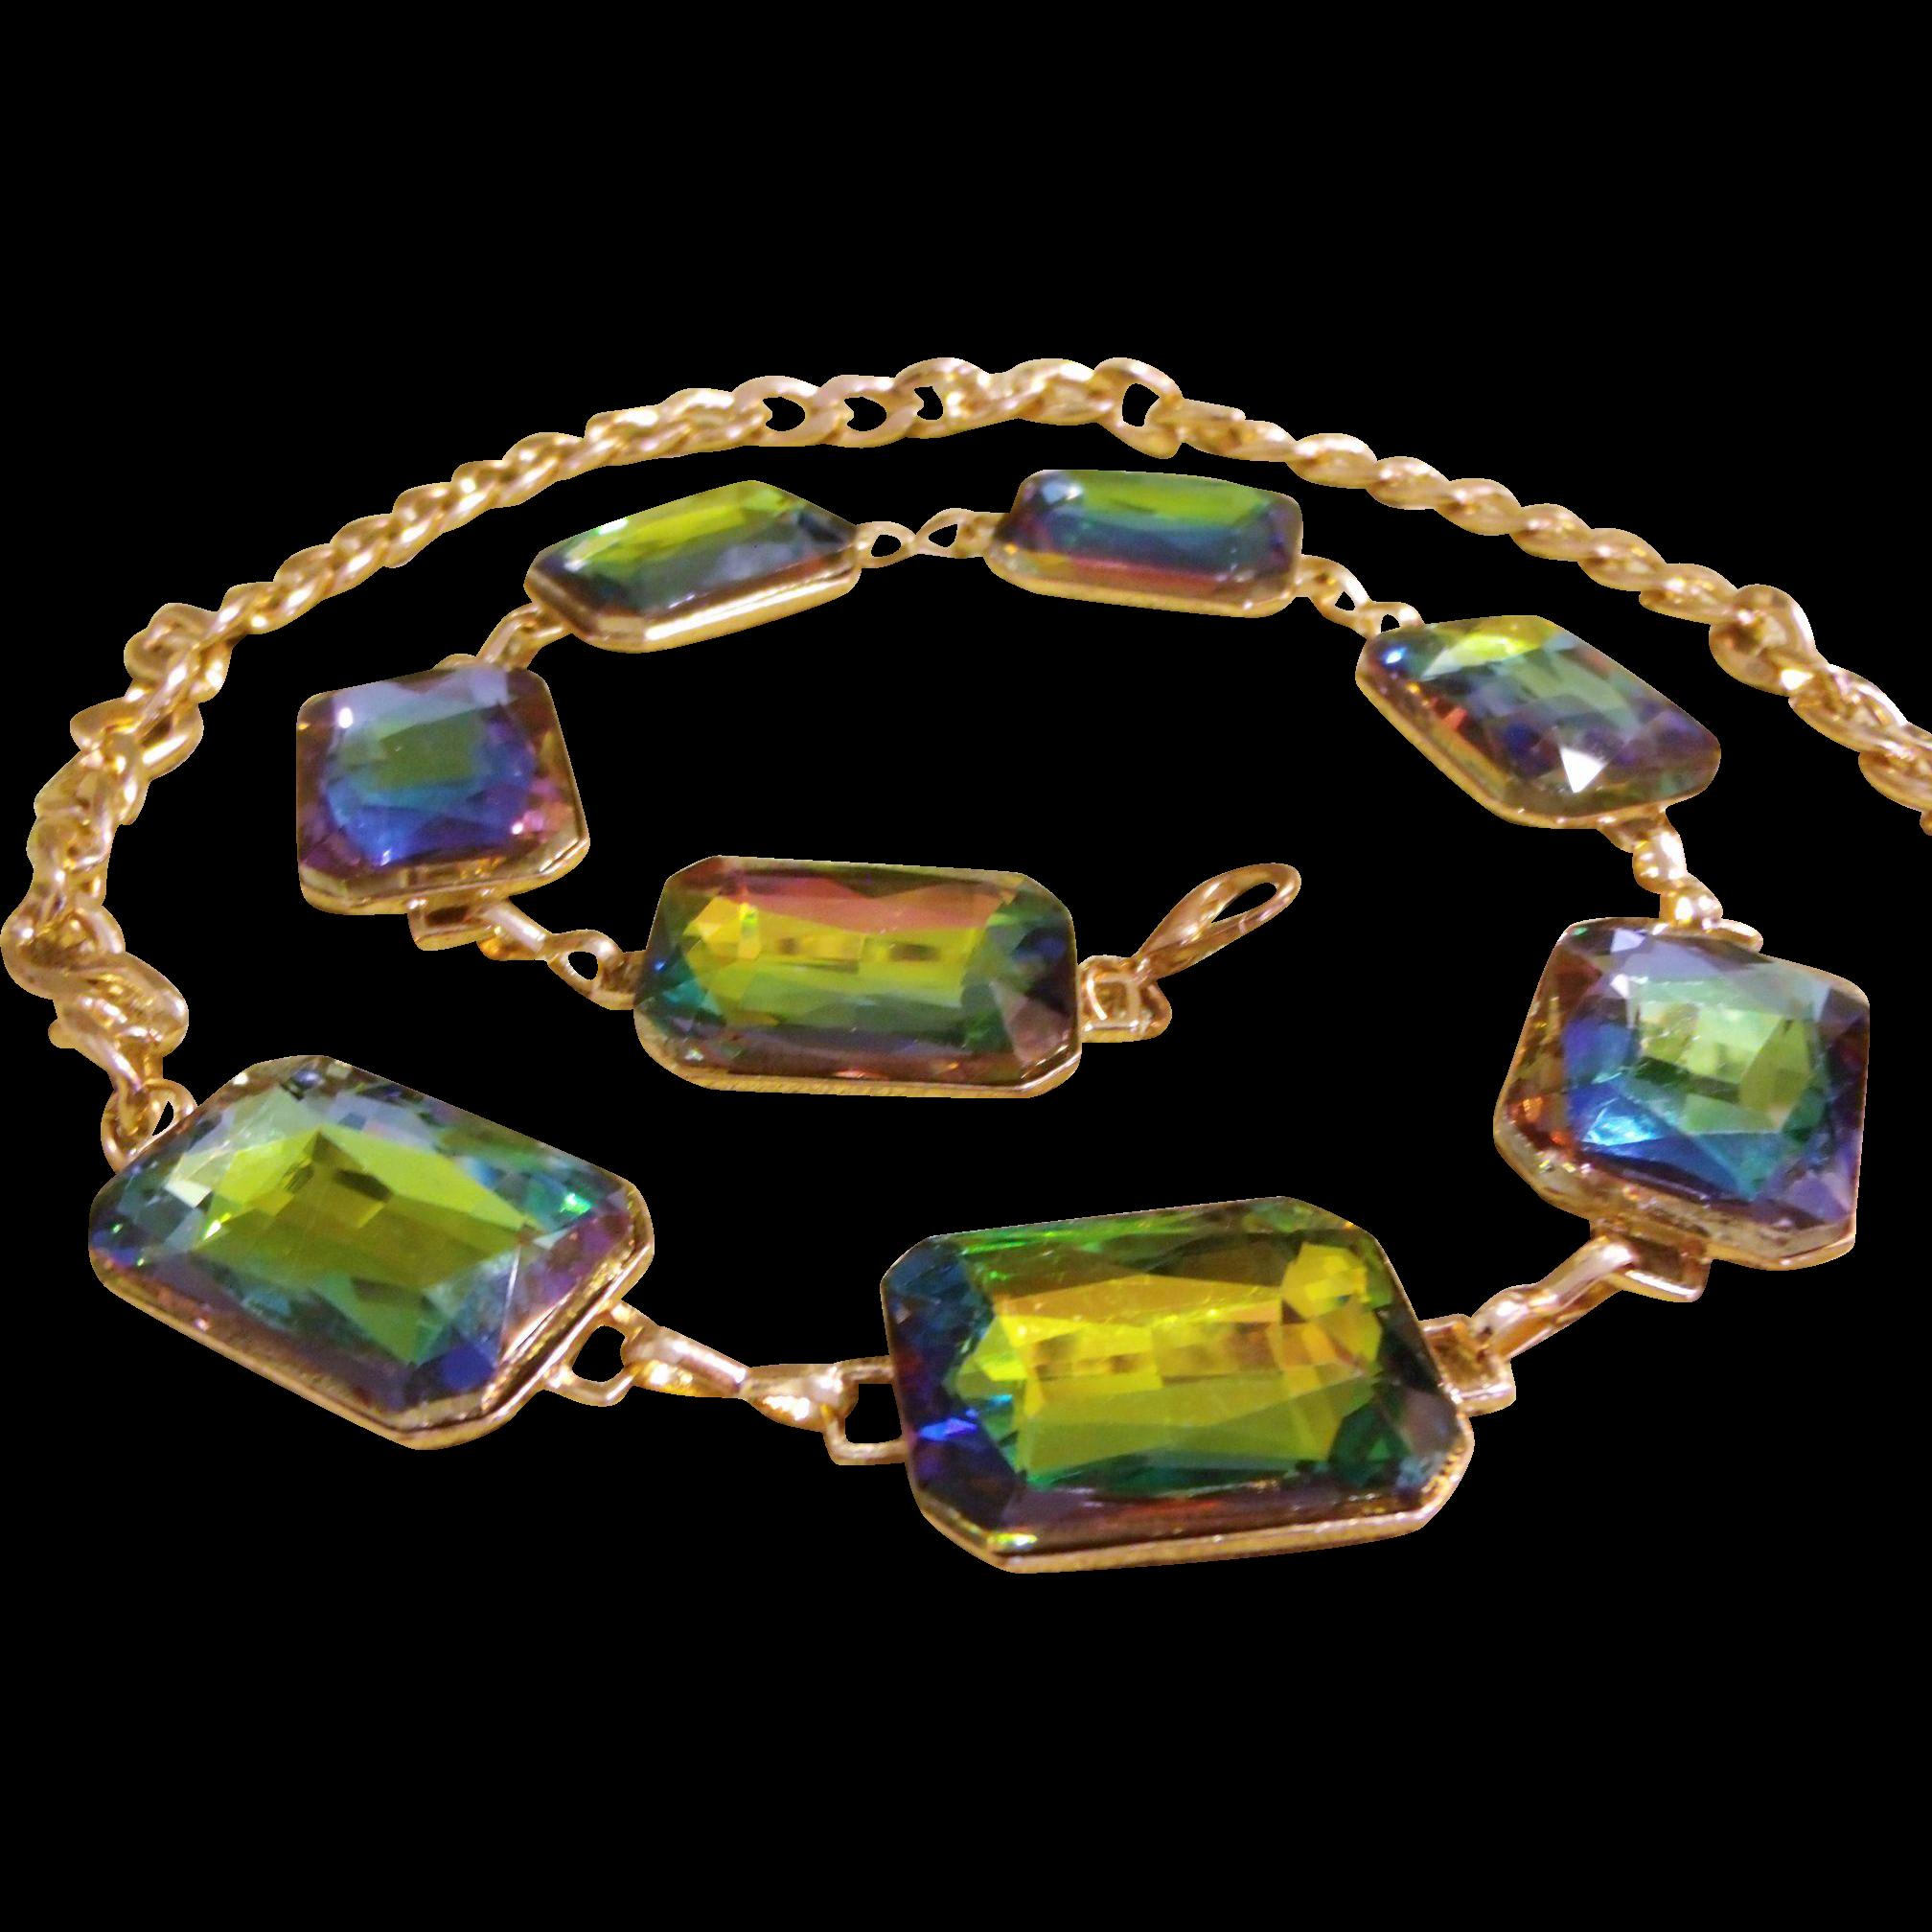 Gold Tone Chain Belt w/ Huge Rainbow Glass Rhinestones